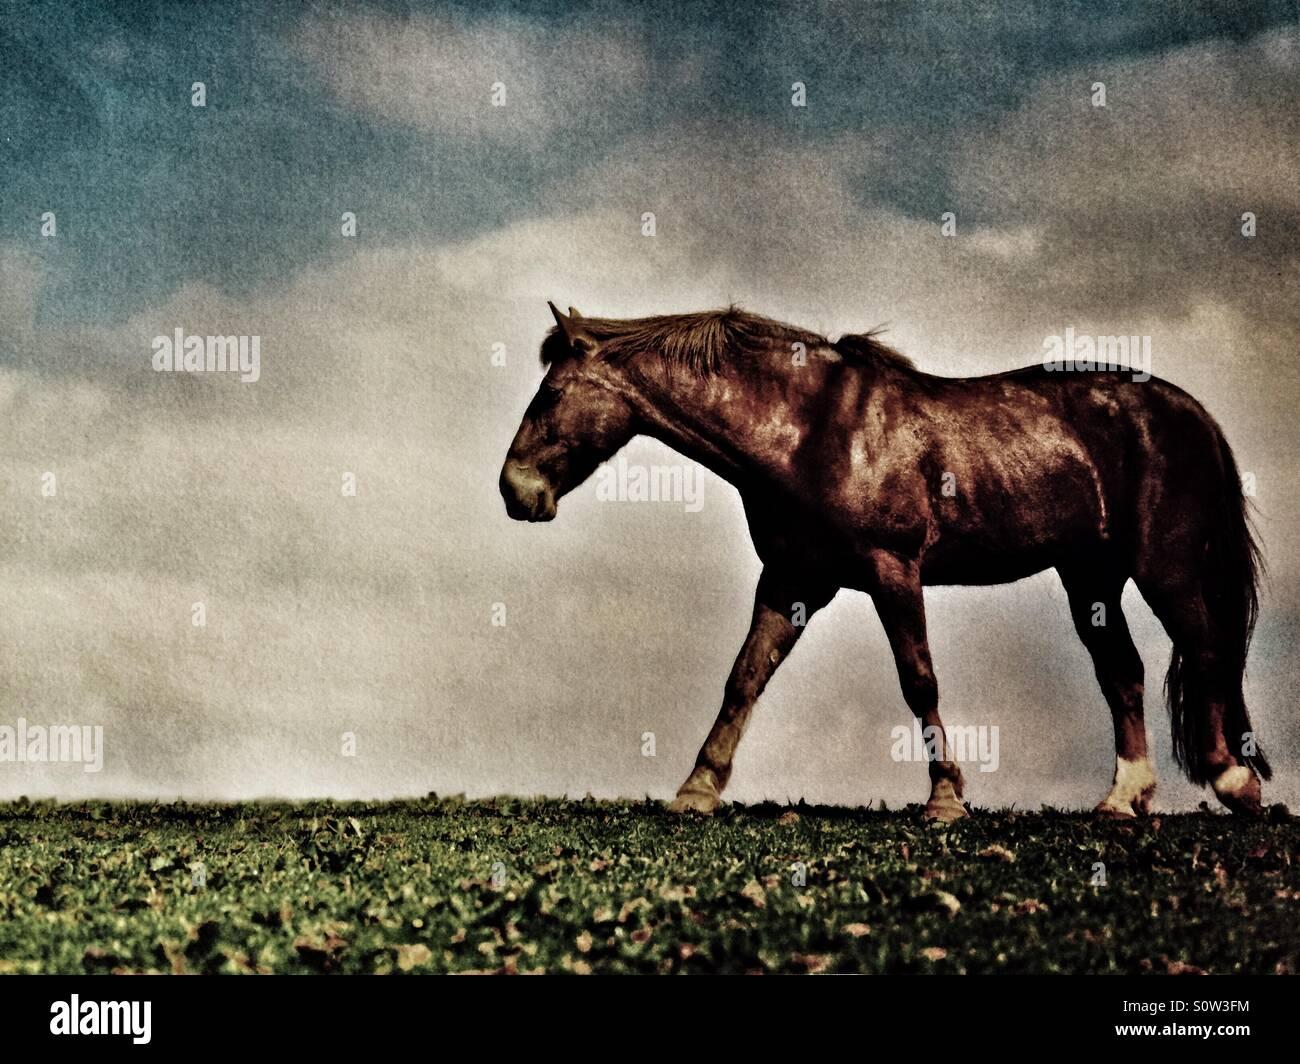 Horse walking through a winter field - Stock Image